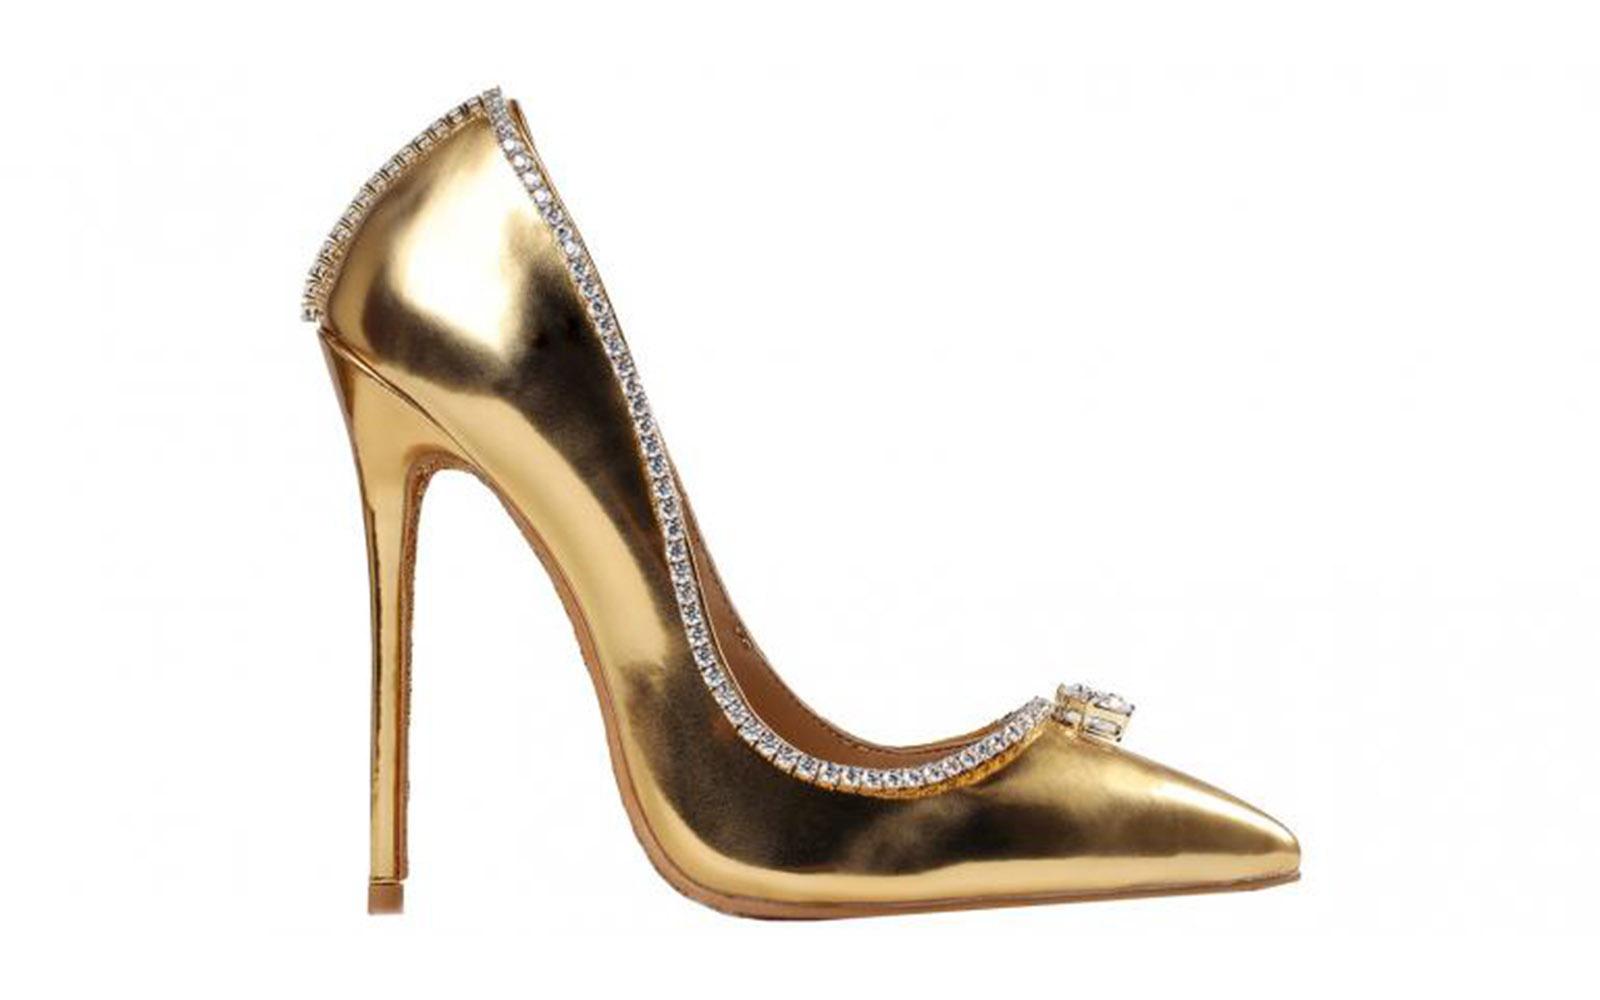 sapatos mais caros do mundo-passion diamond-ouro-01-boatshopping